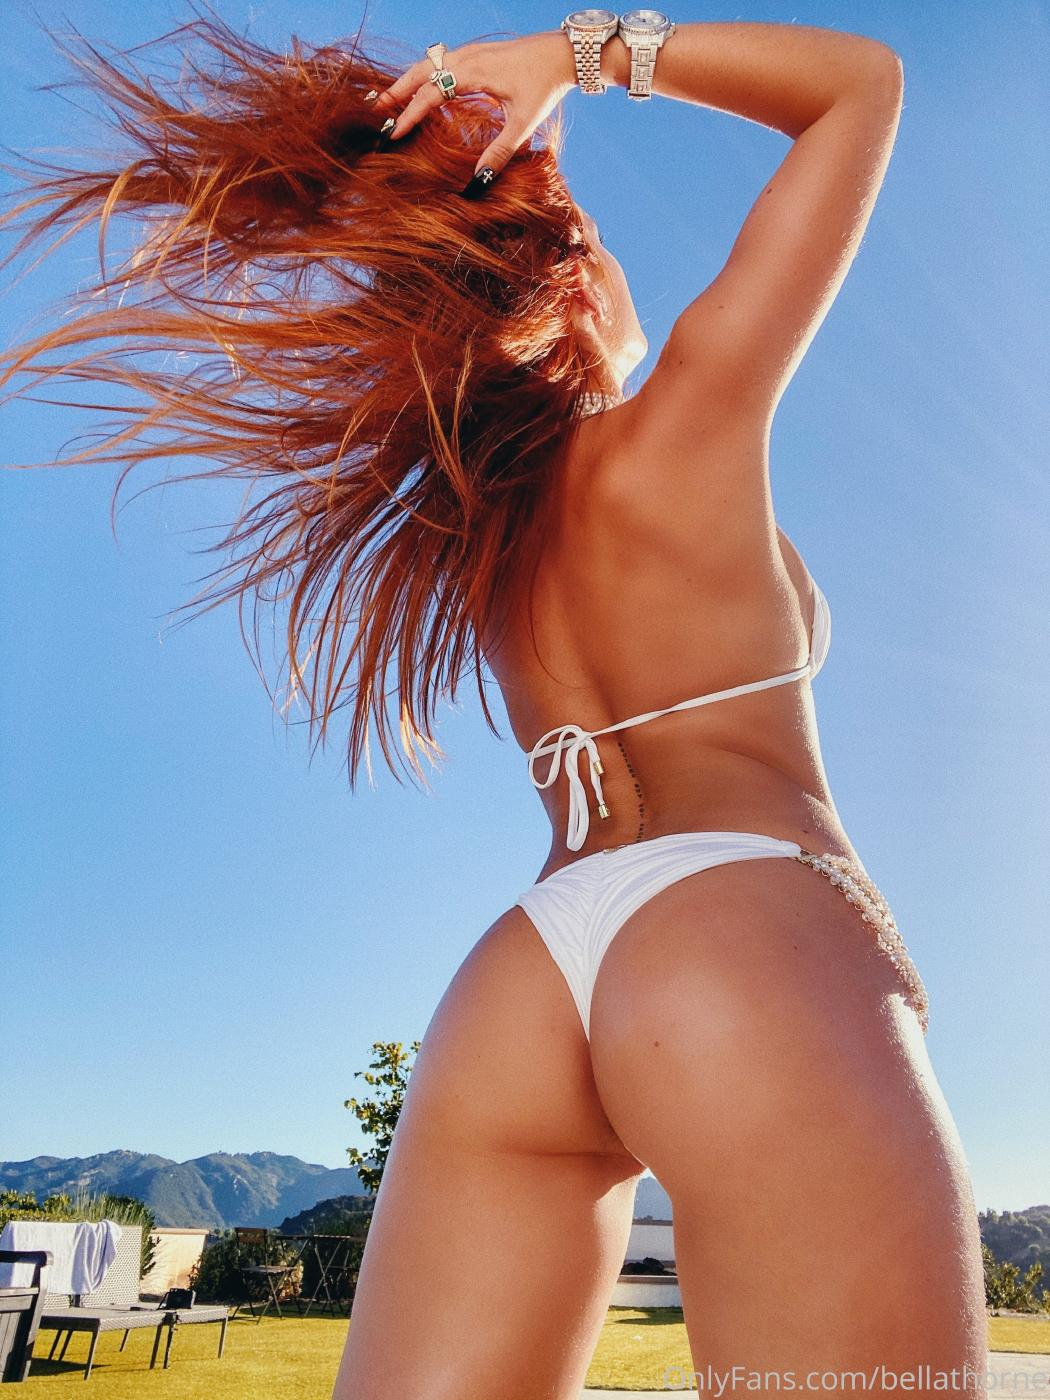 Bella Thorne Pool Bikini Onlyfans Set Leaked 0020